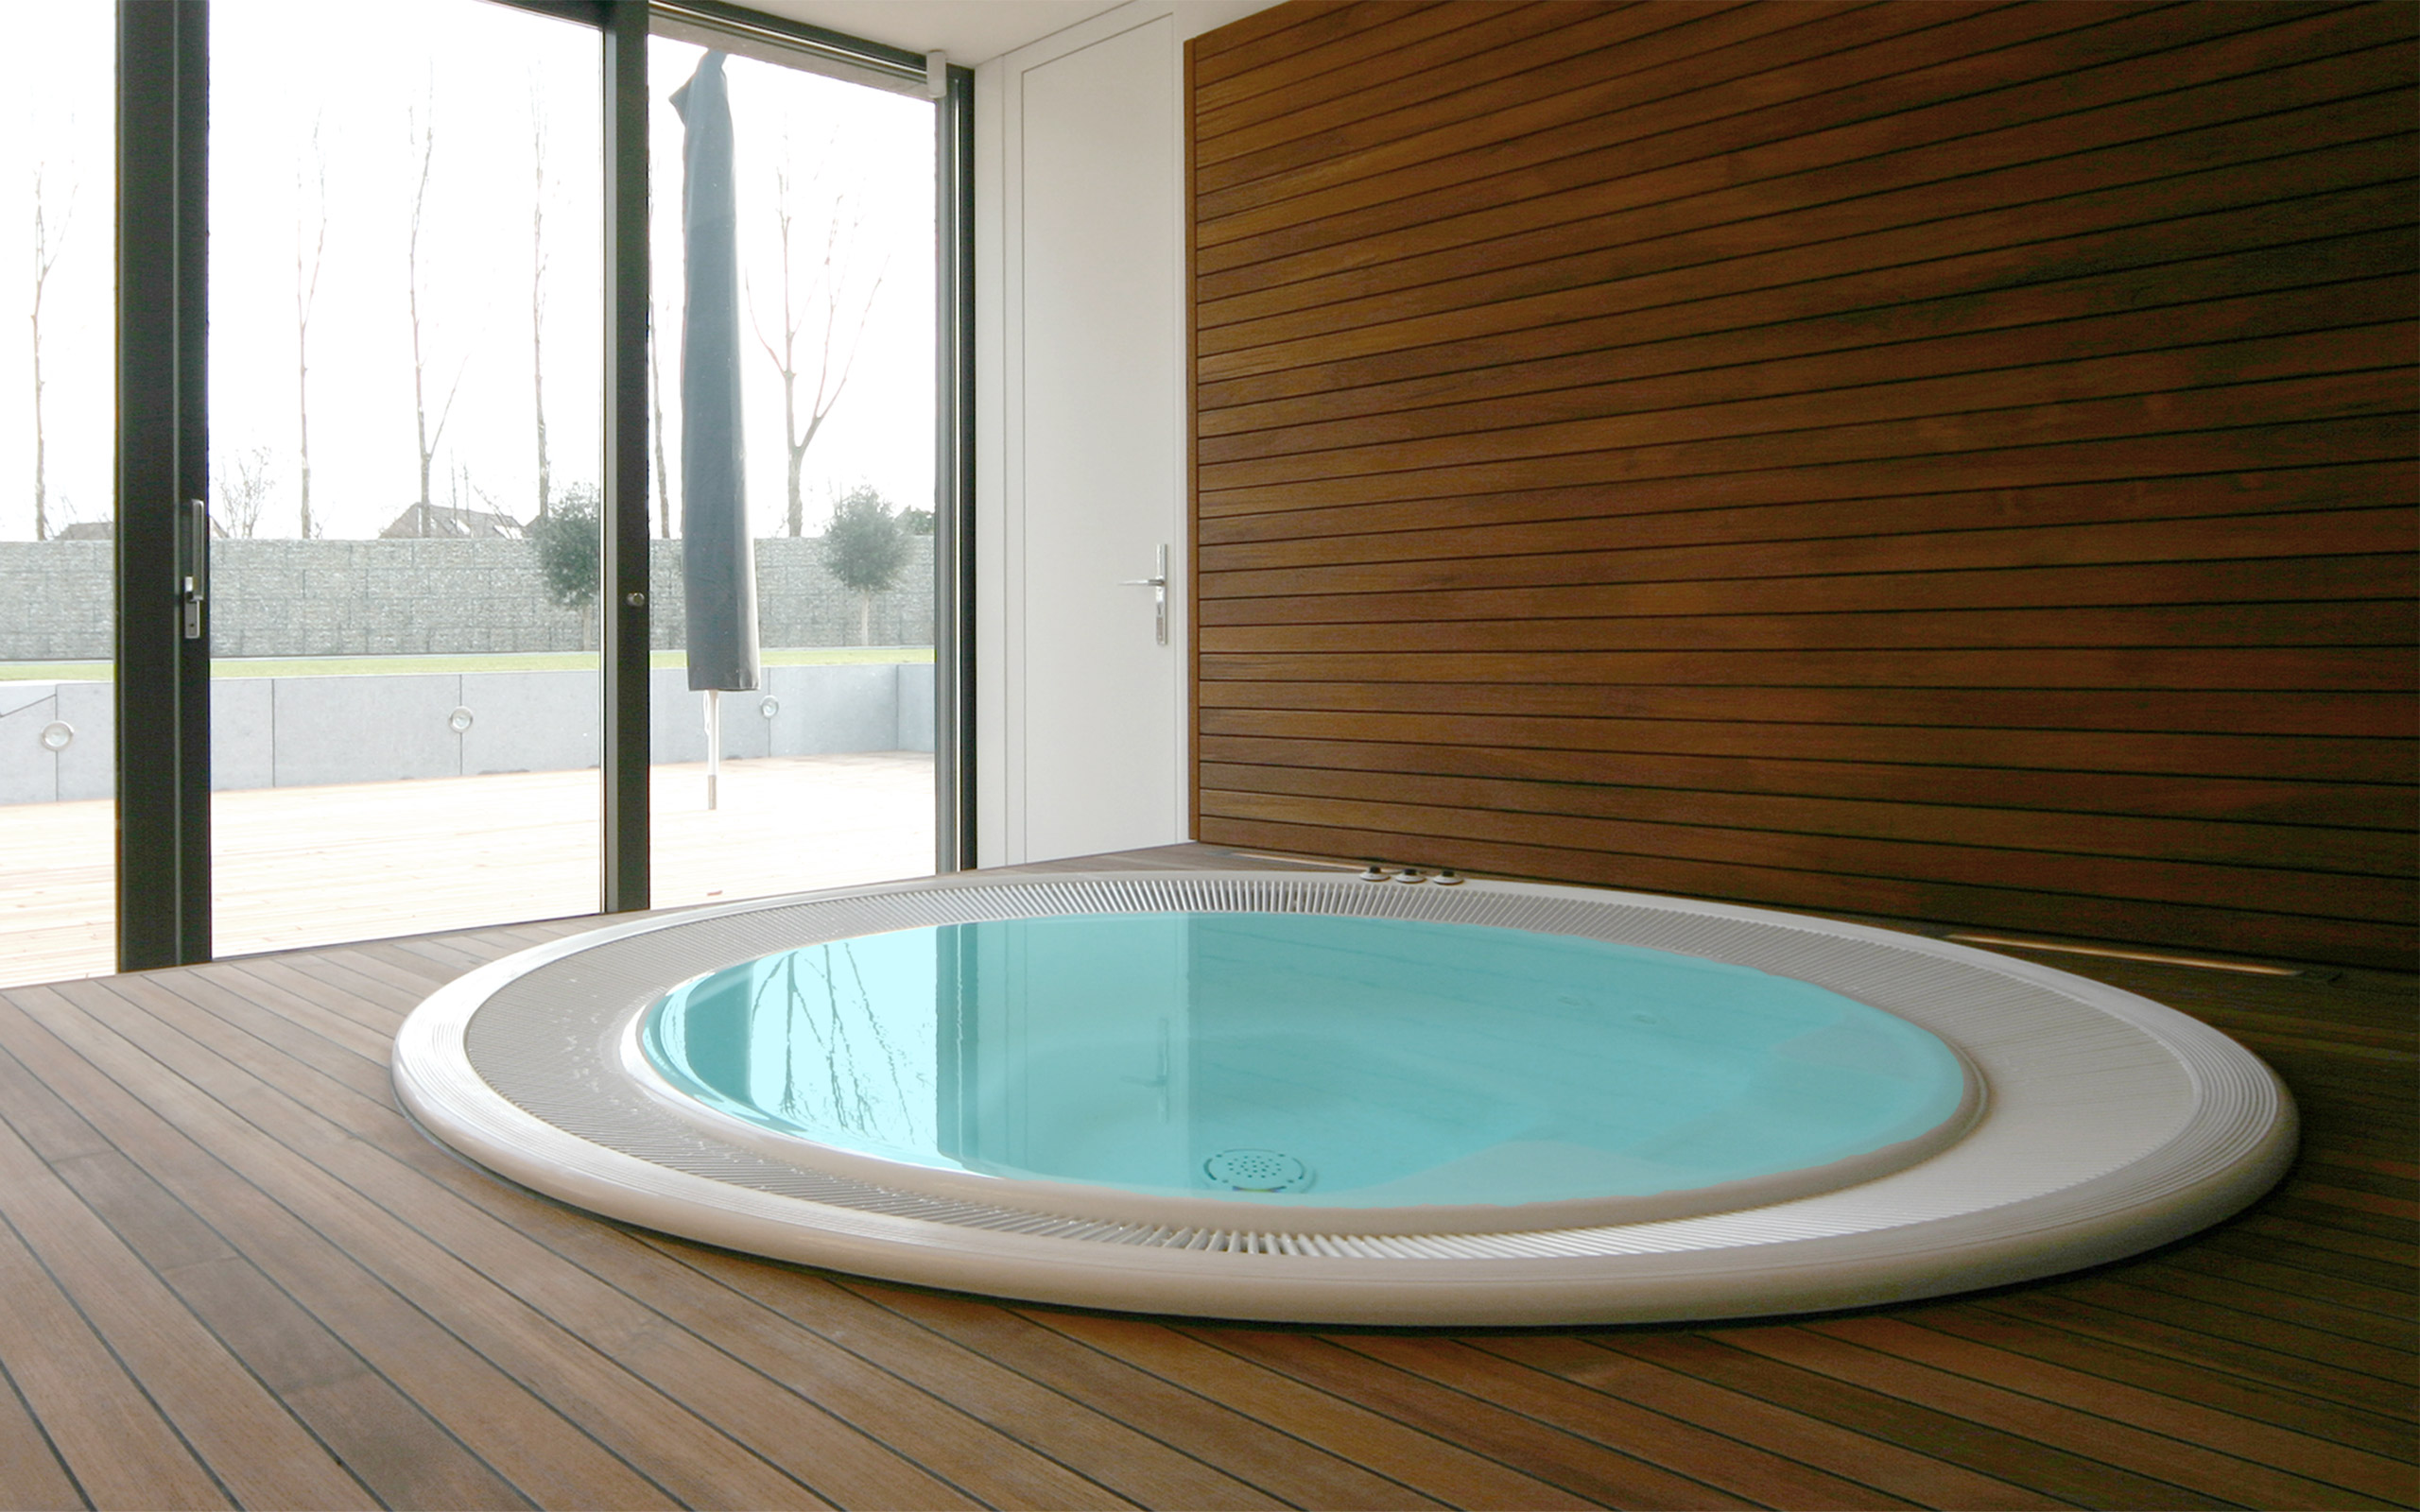 einbau whirlpool outdoor. Black Bedroom Furniture Sets. Home Design Ideas